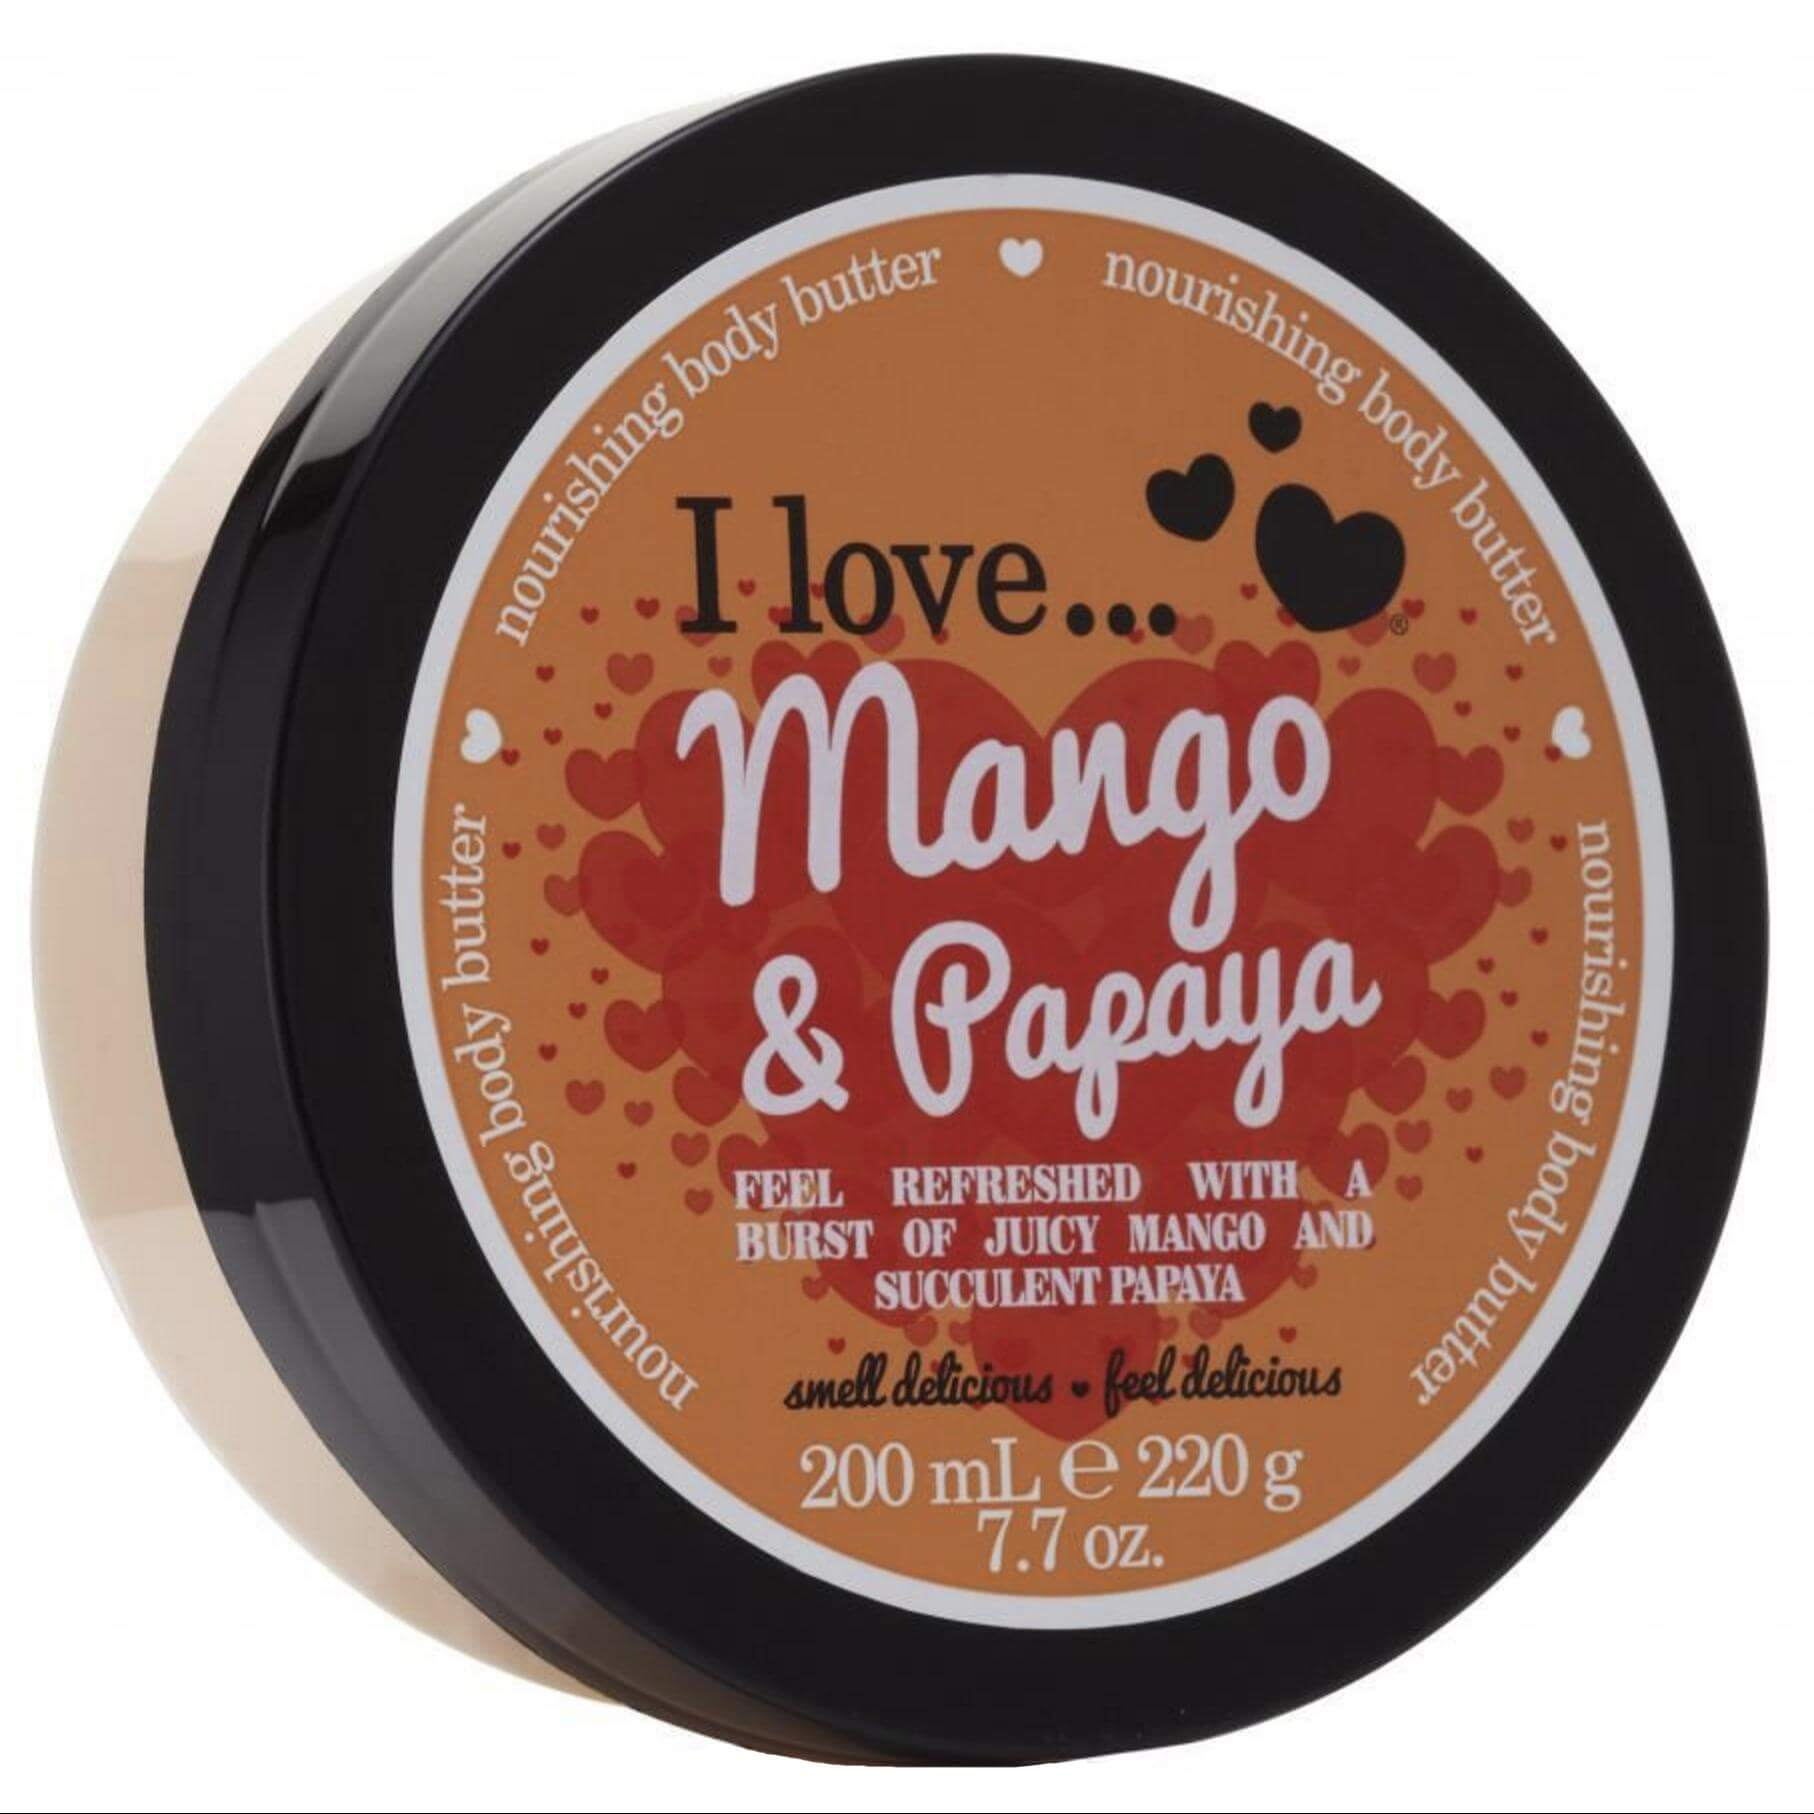 I love… Nourishing Body Butter Θρεπτικό Βούτυρο Σώματος200ml – Mango & Papaya